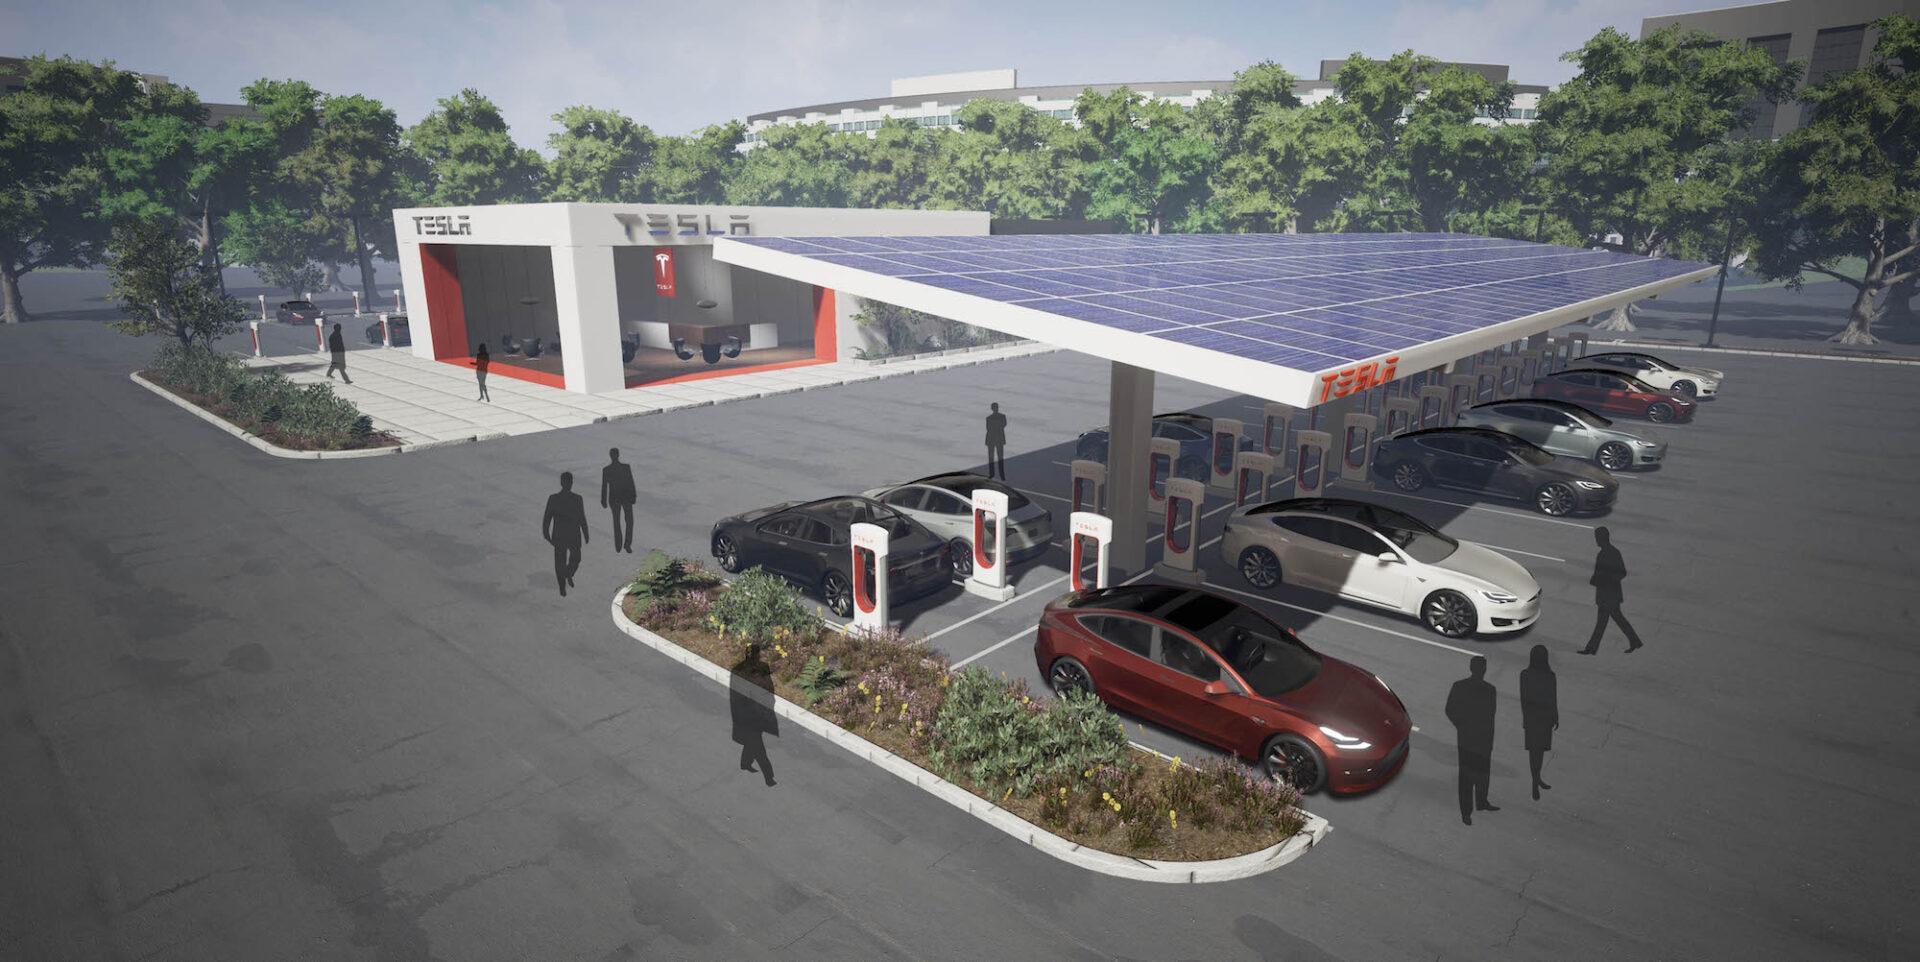 Tesla charging stations 2